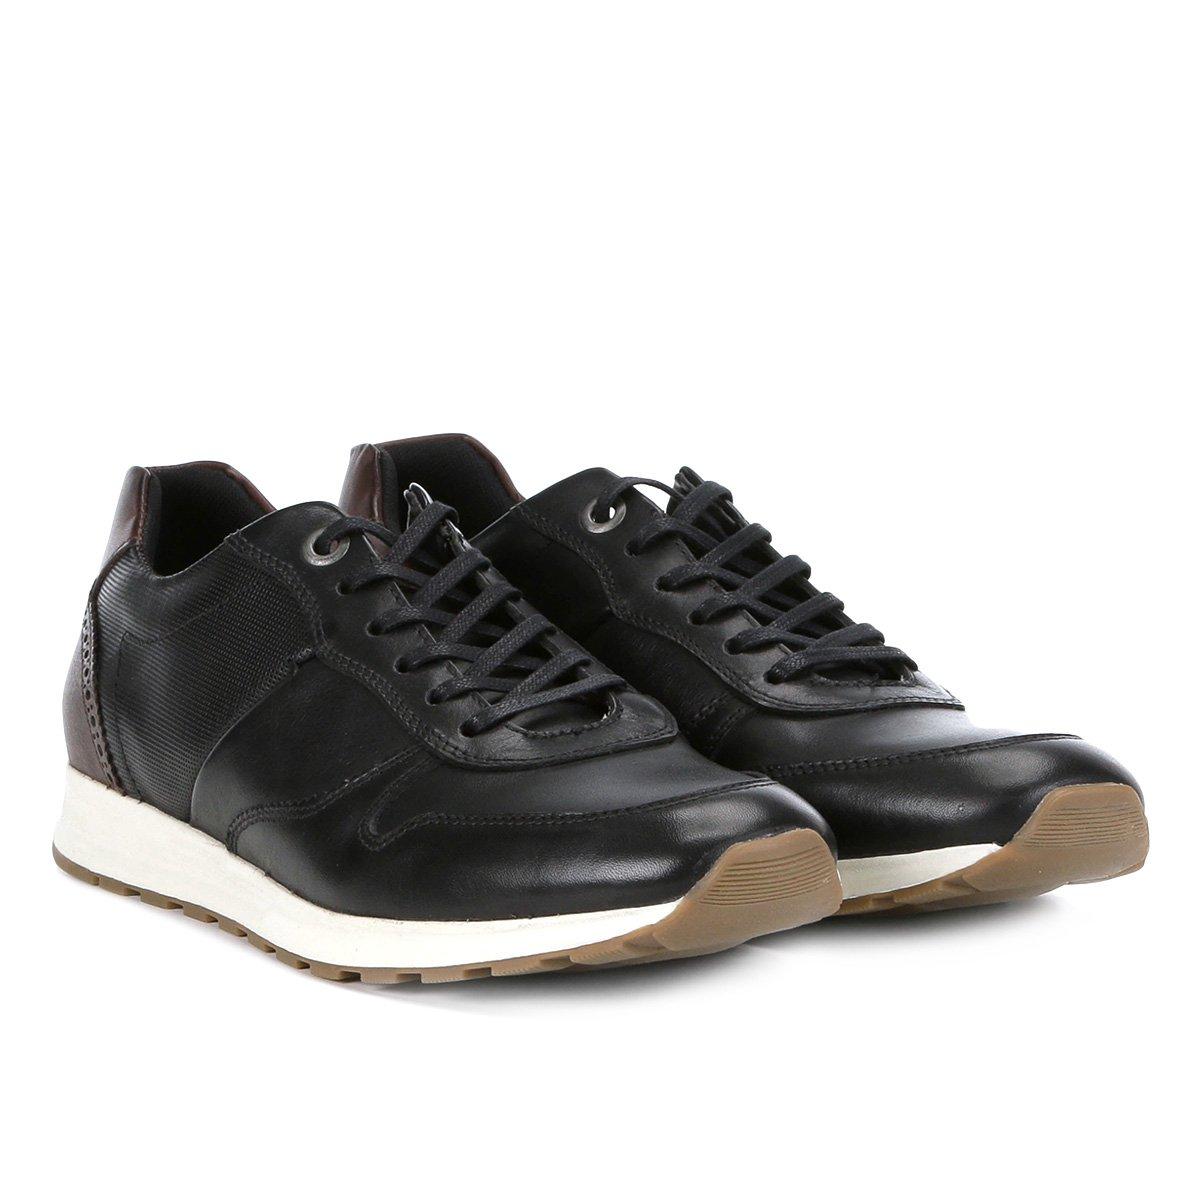 028fc5b72d Tênis Couro Shoestock Brogues Masculino | Shoestock